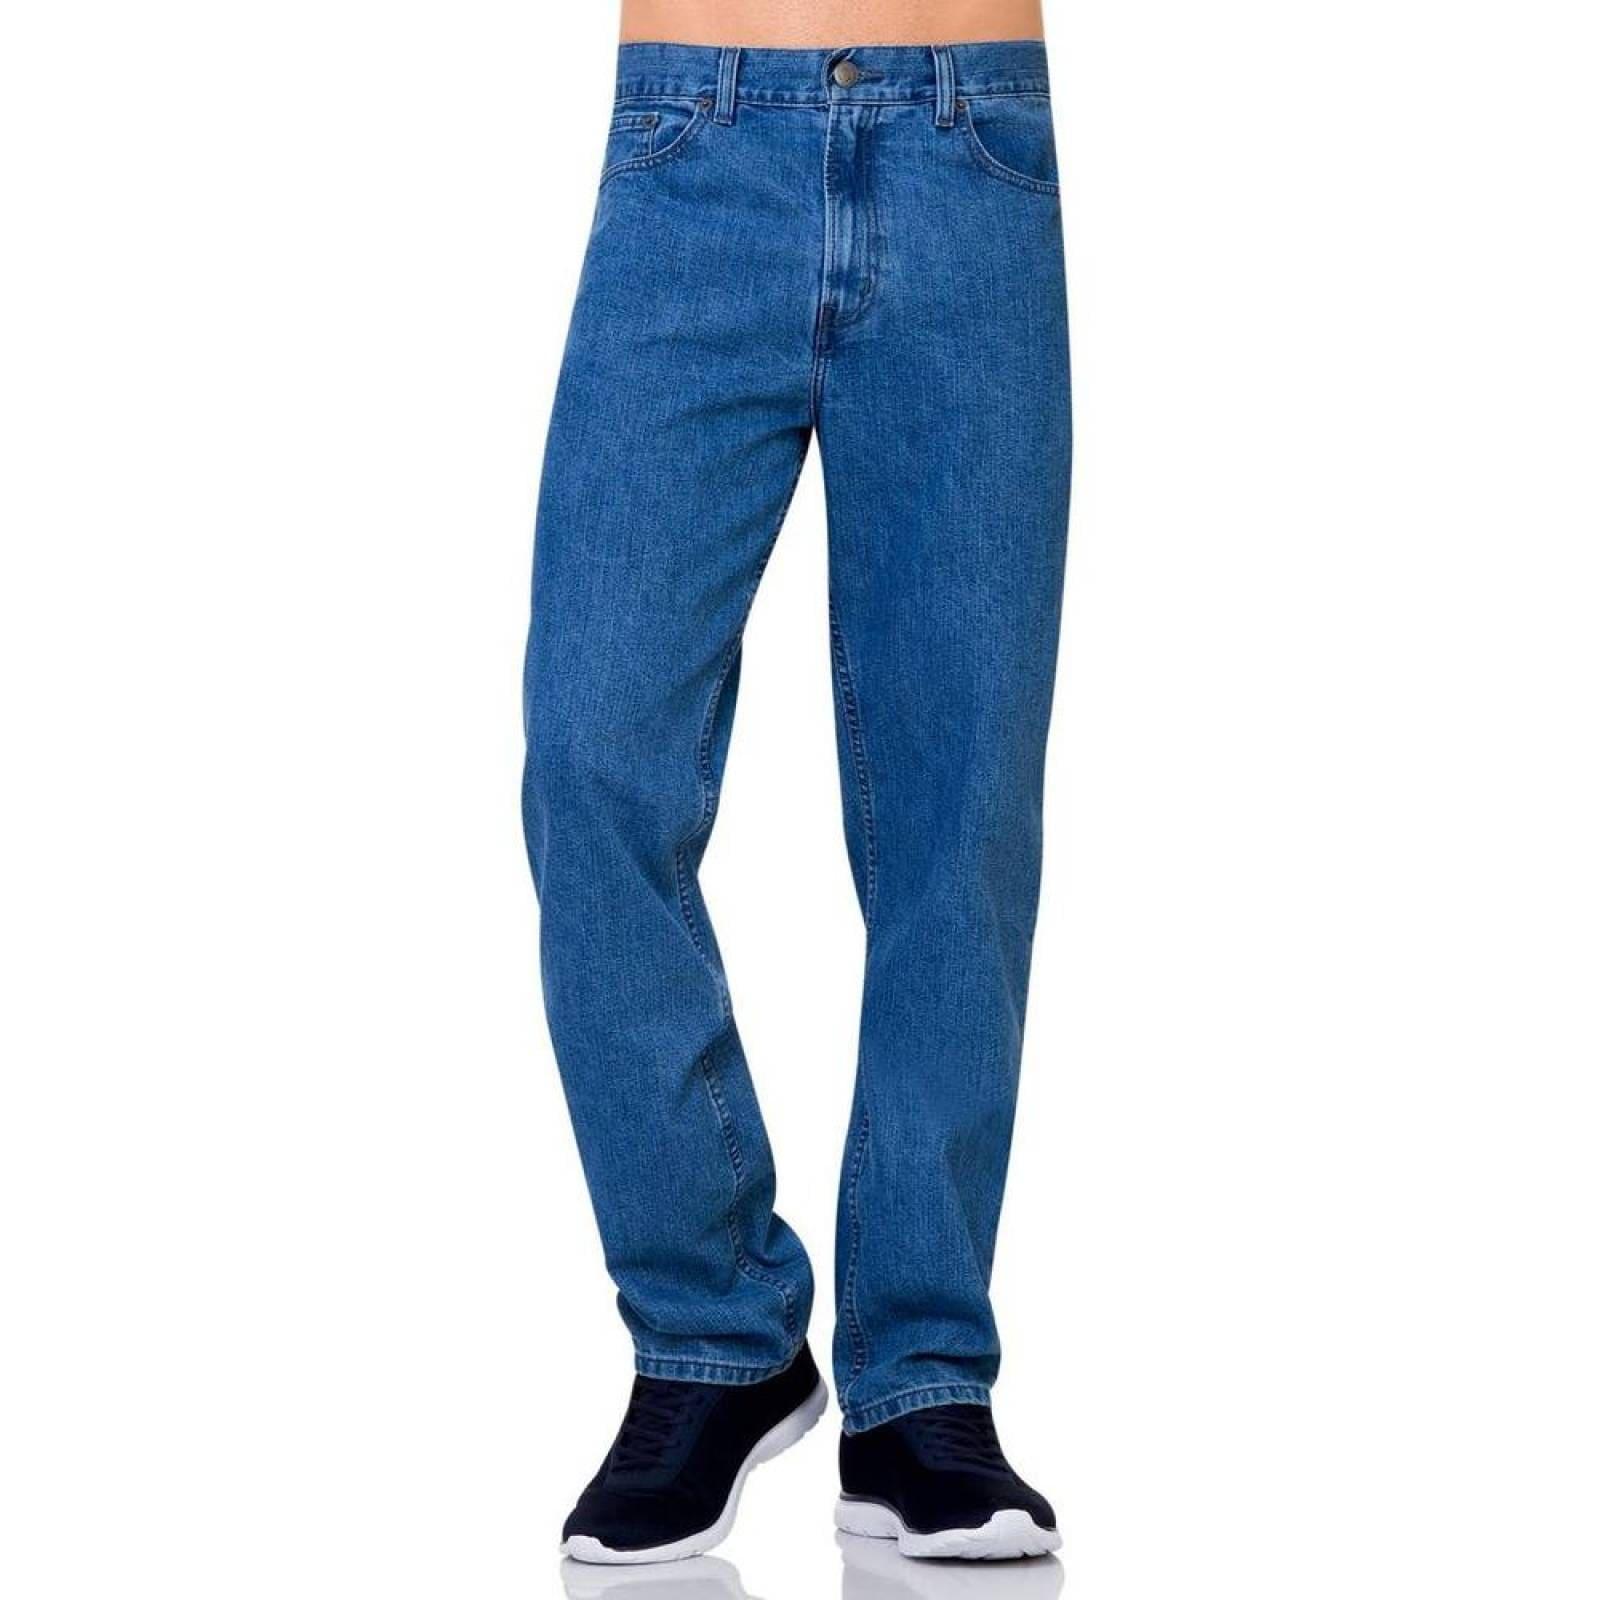 Jeans Oggi Jeans Hombre Azul Mezclilla Power